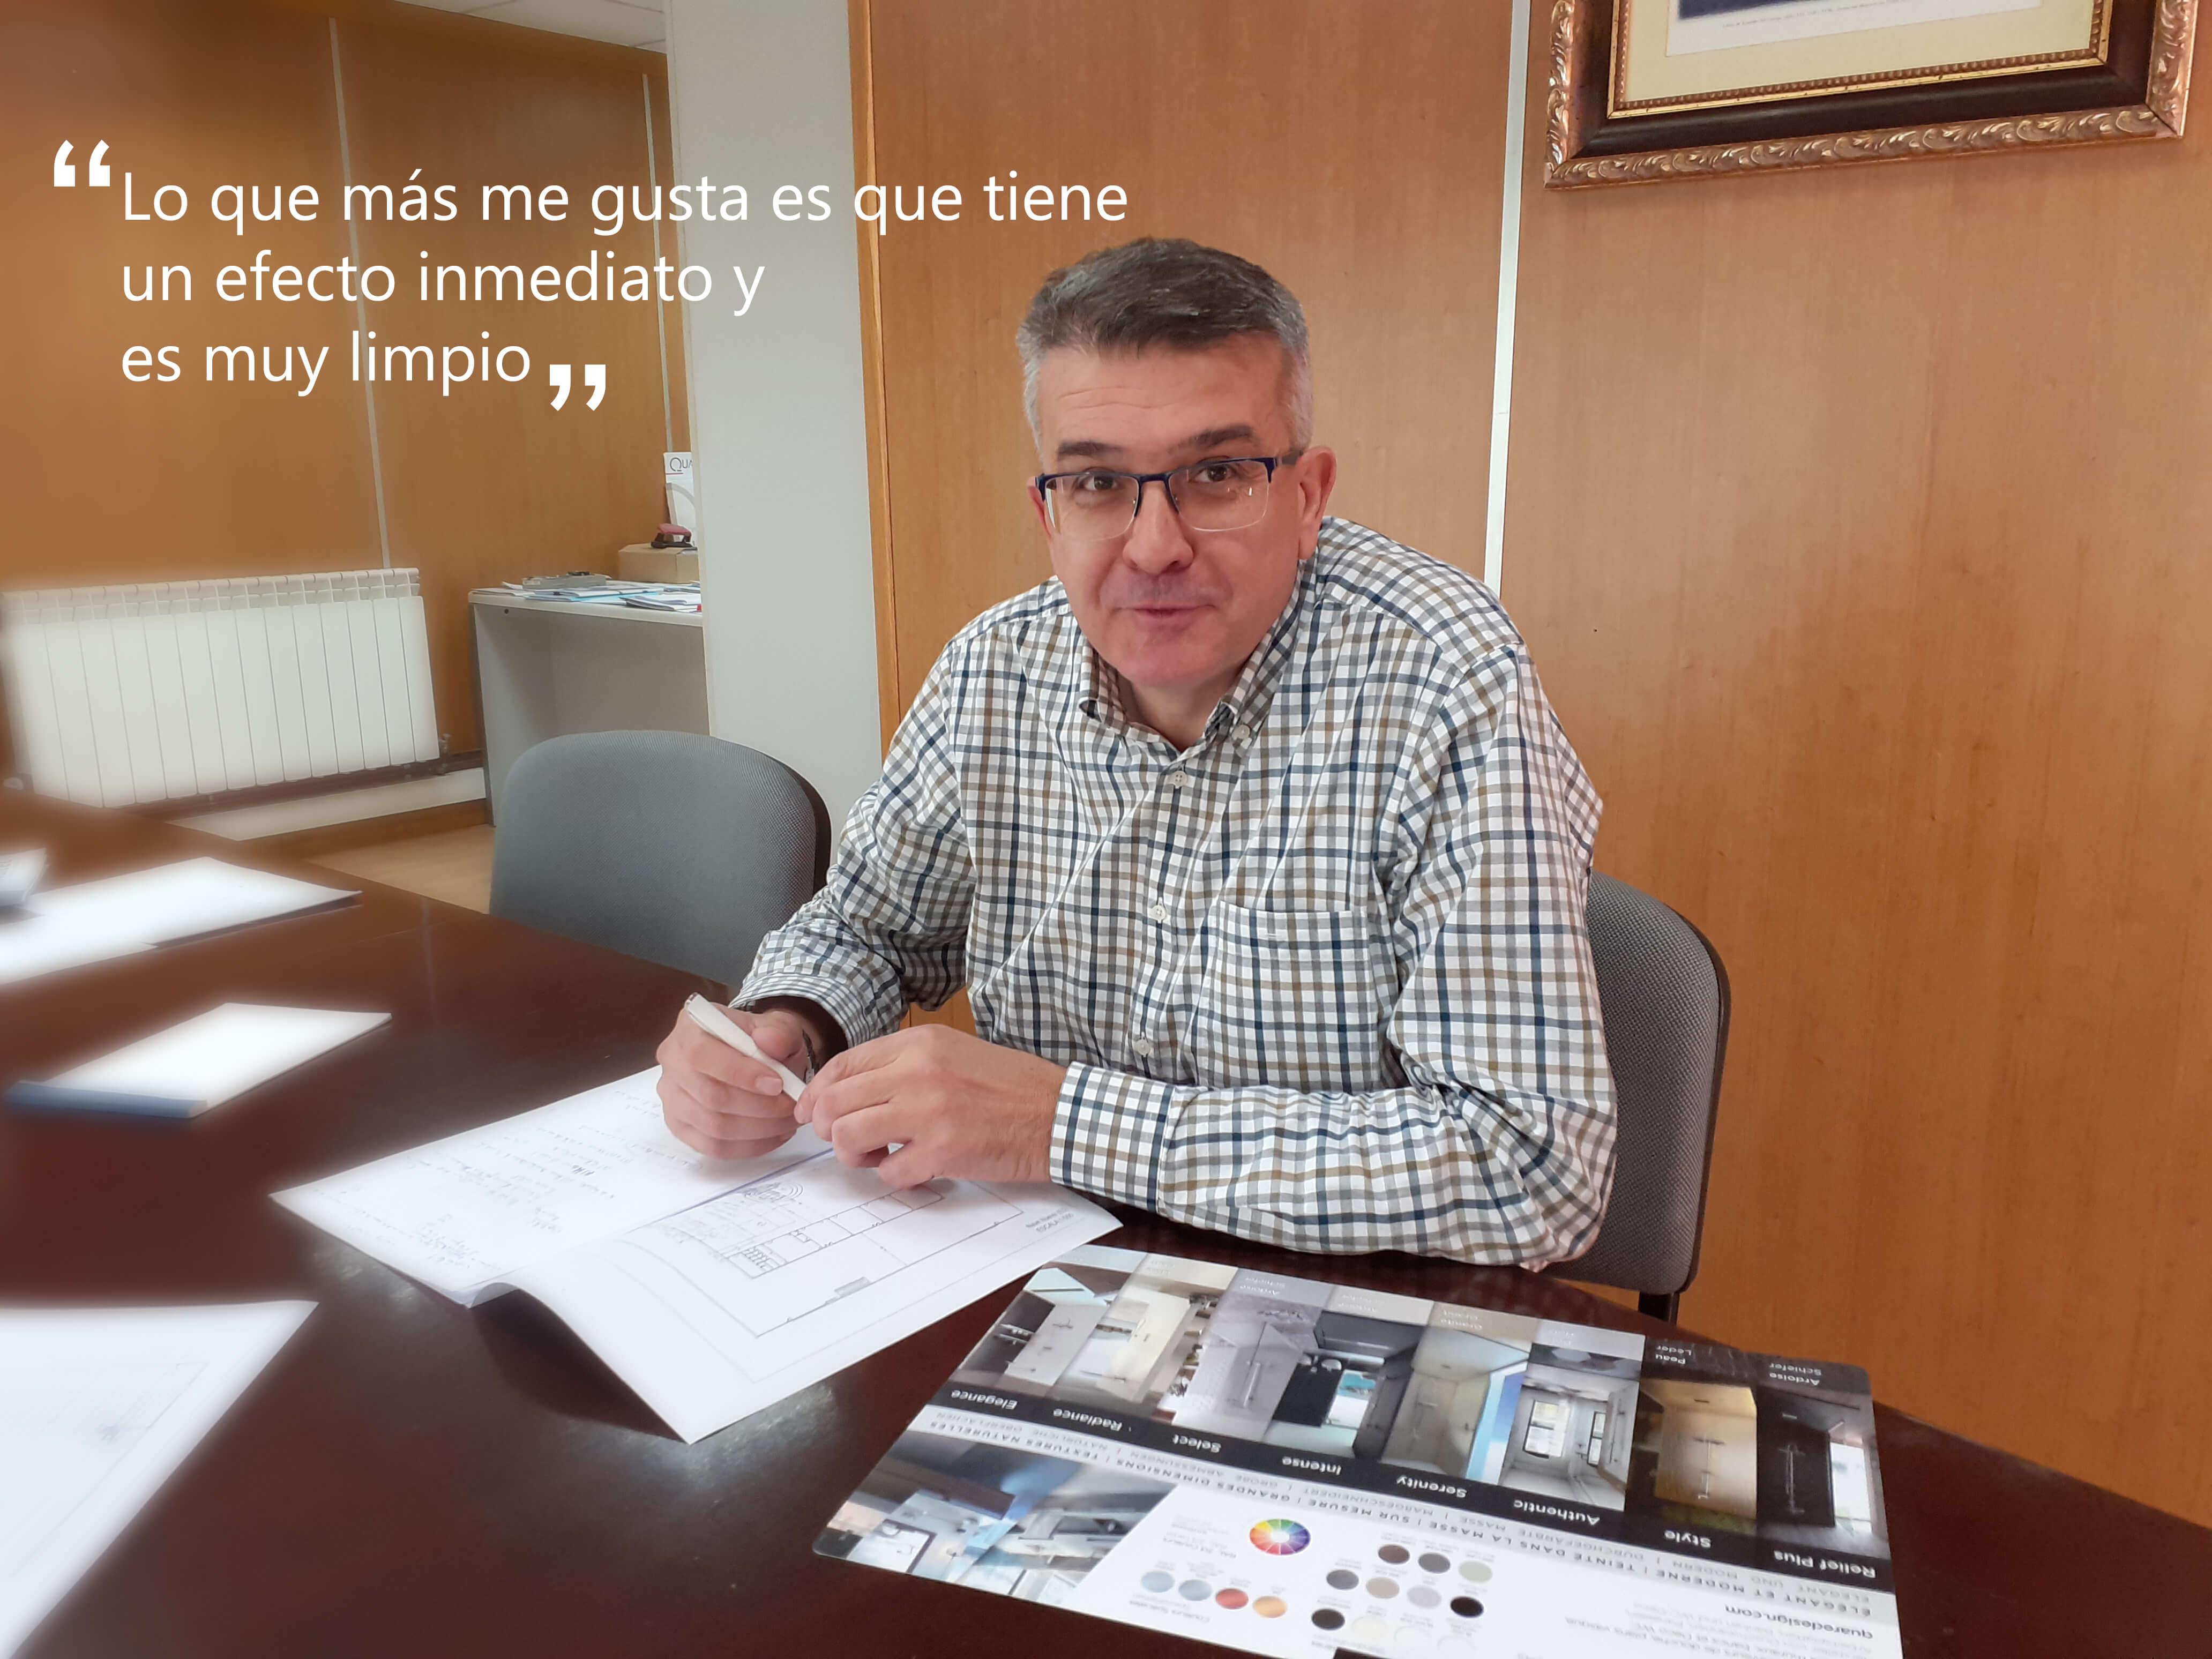 Entrevista a Julio Castillo Fernández Director de Quare Design S. L.